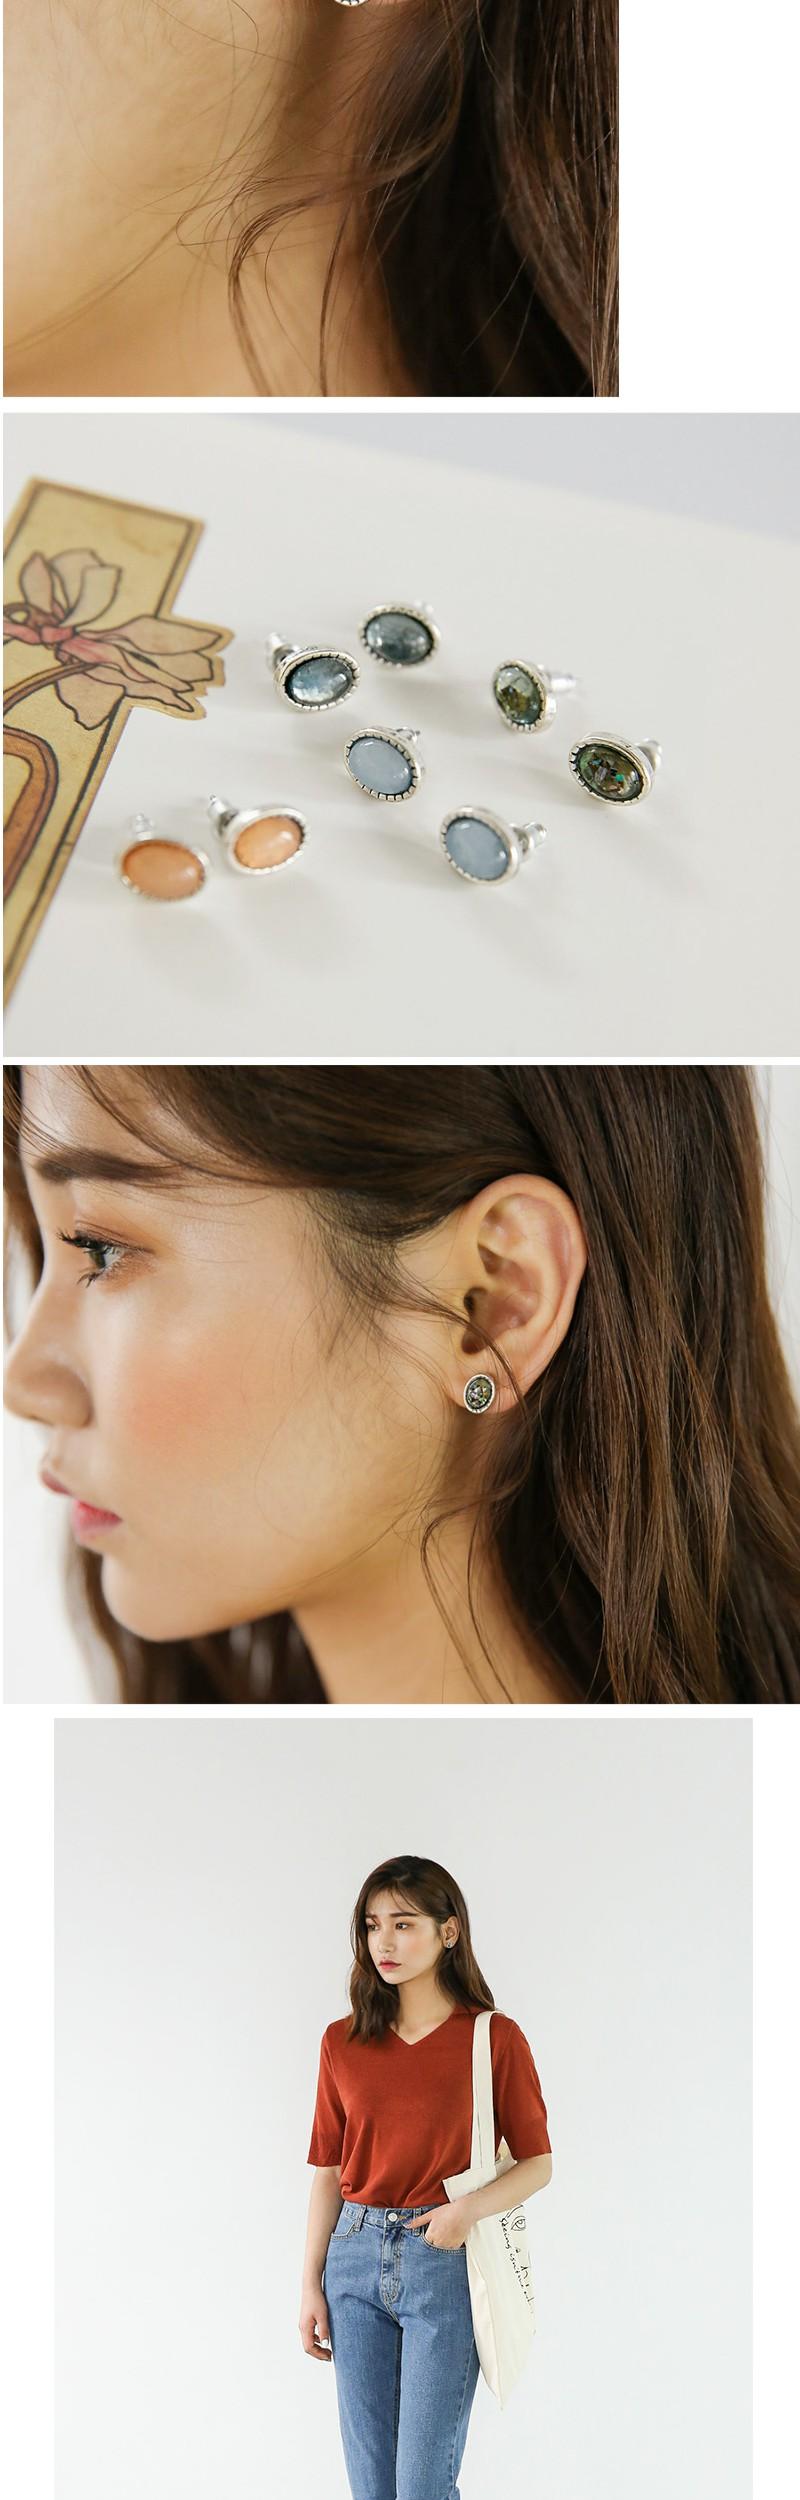 the universe earring set